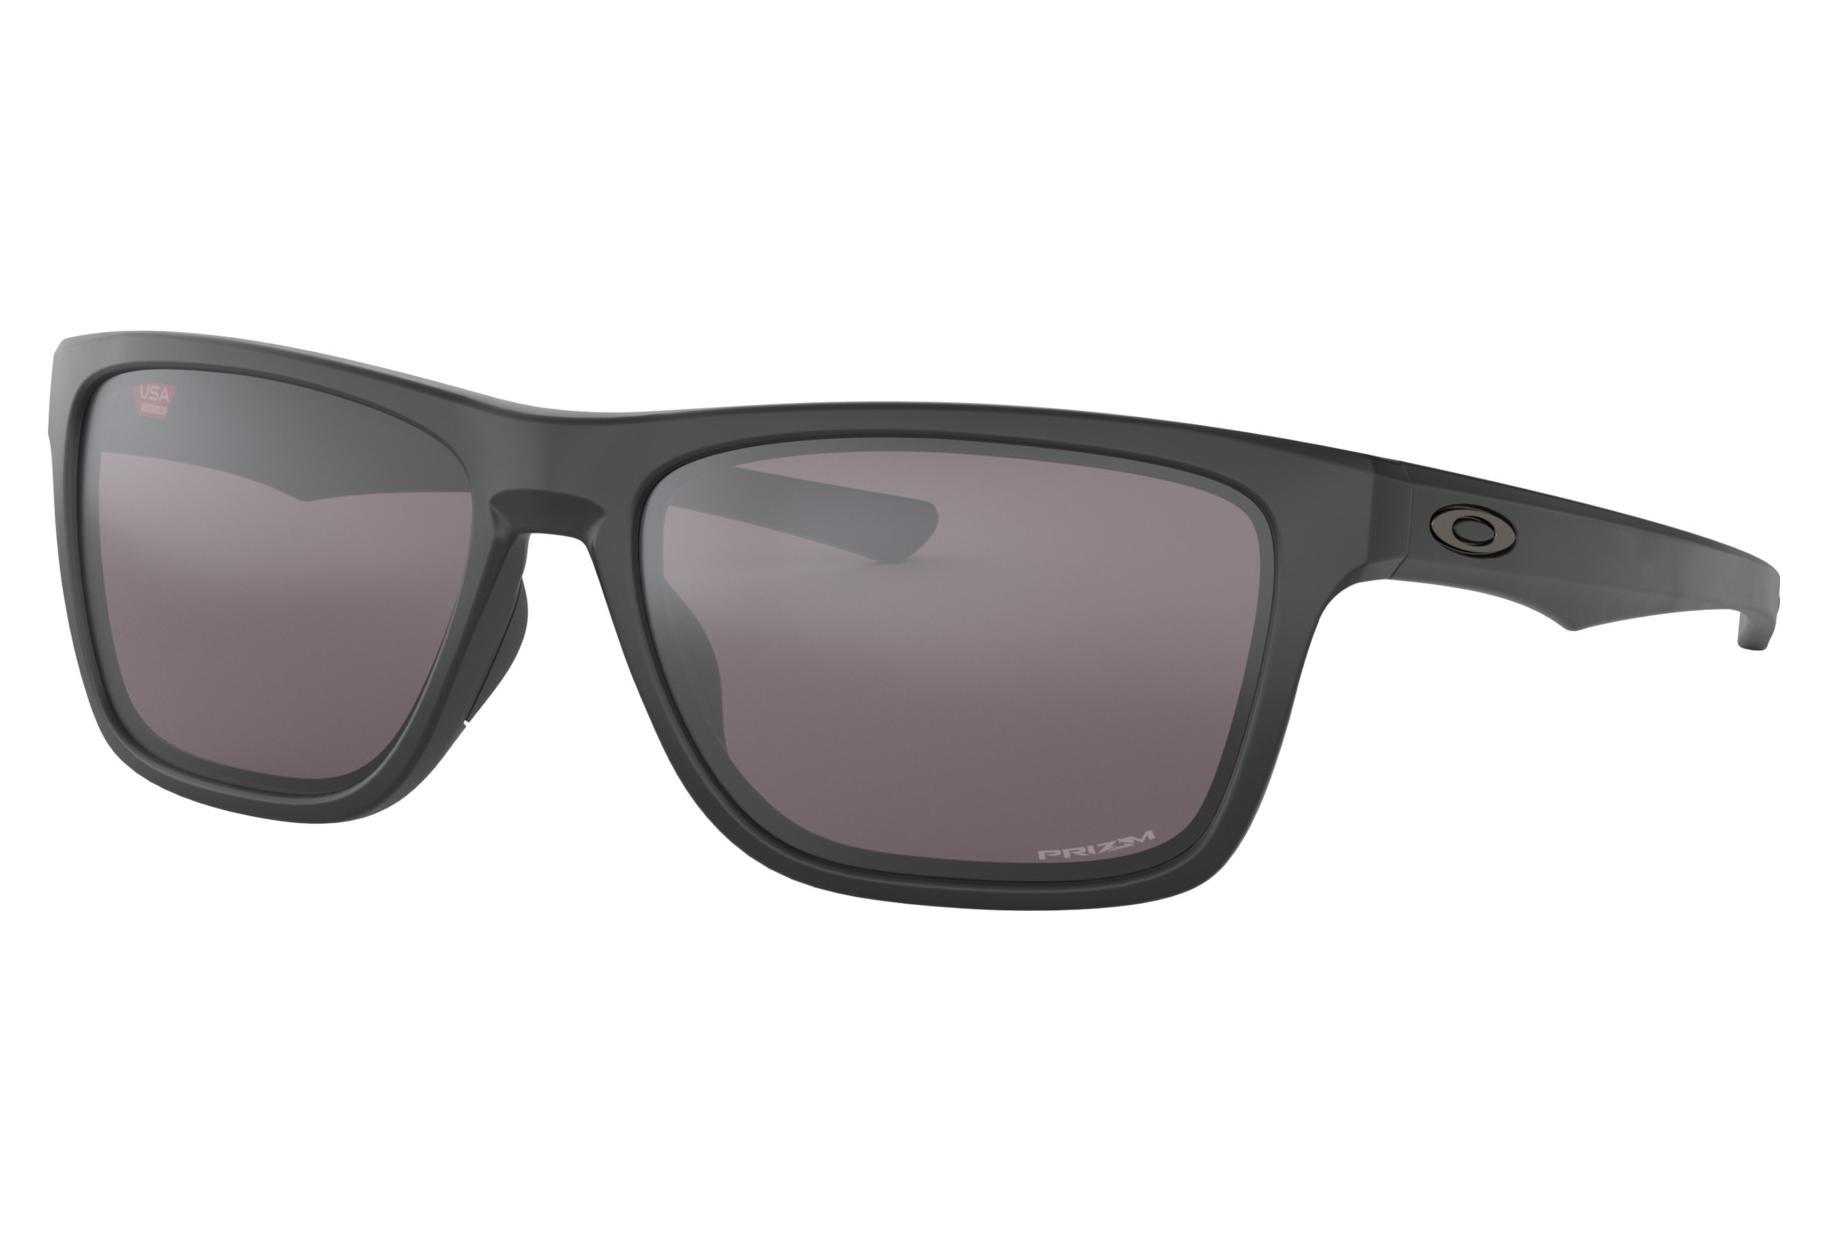 d0e4fb70ad7760 Lunettes Oakley HOLSTON Matt Black Prizm Grey Ref OO9334-0858 ...